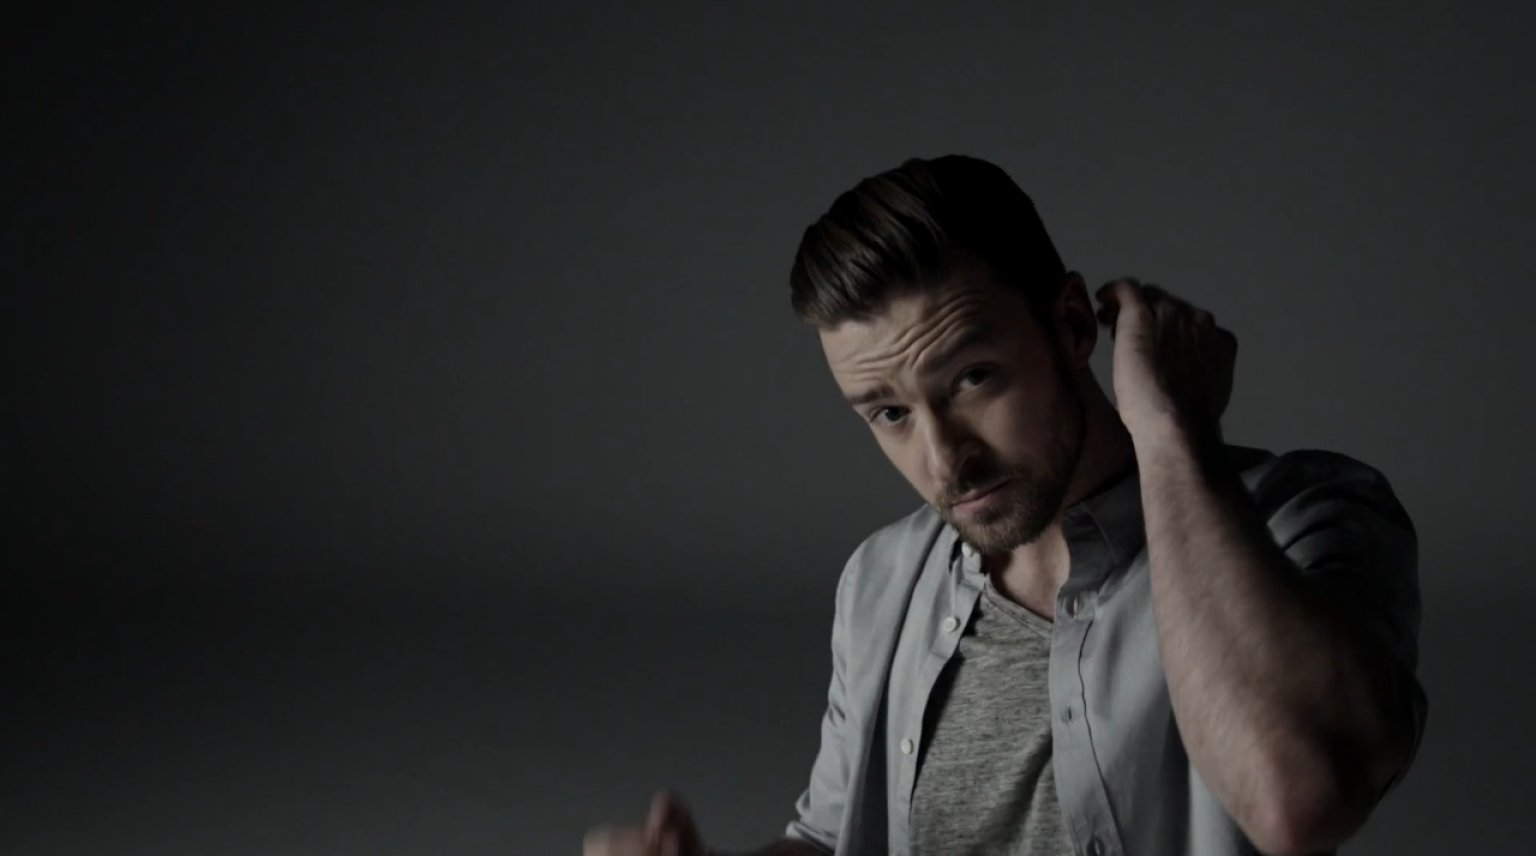 Justin Timberlake - Tunnel Vision   Video   HYPEBEAST